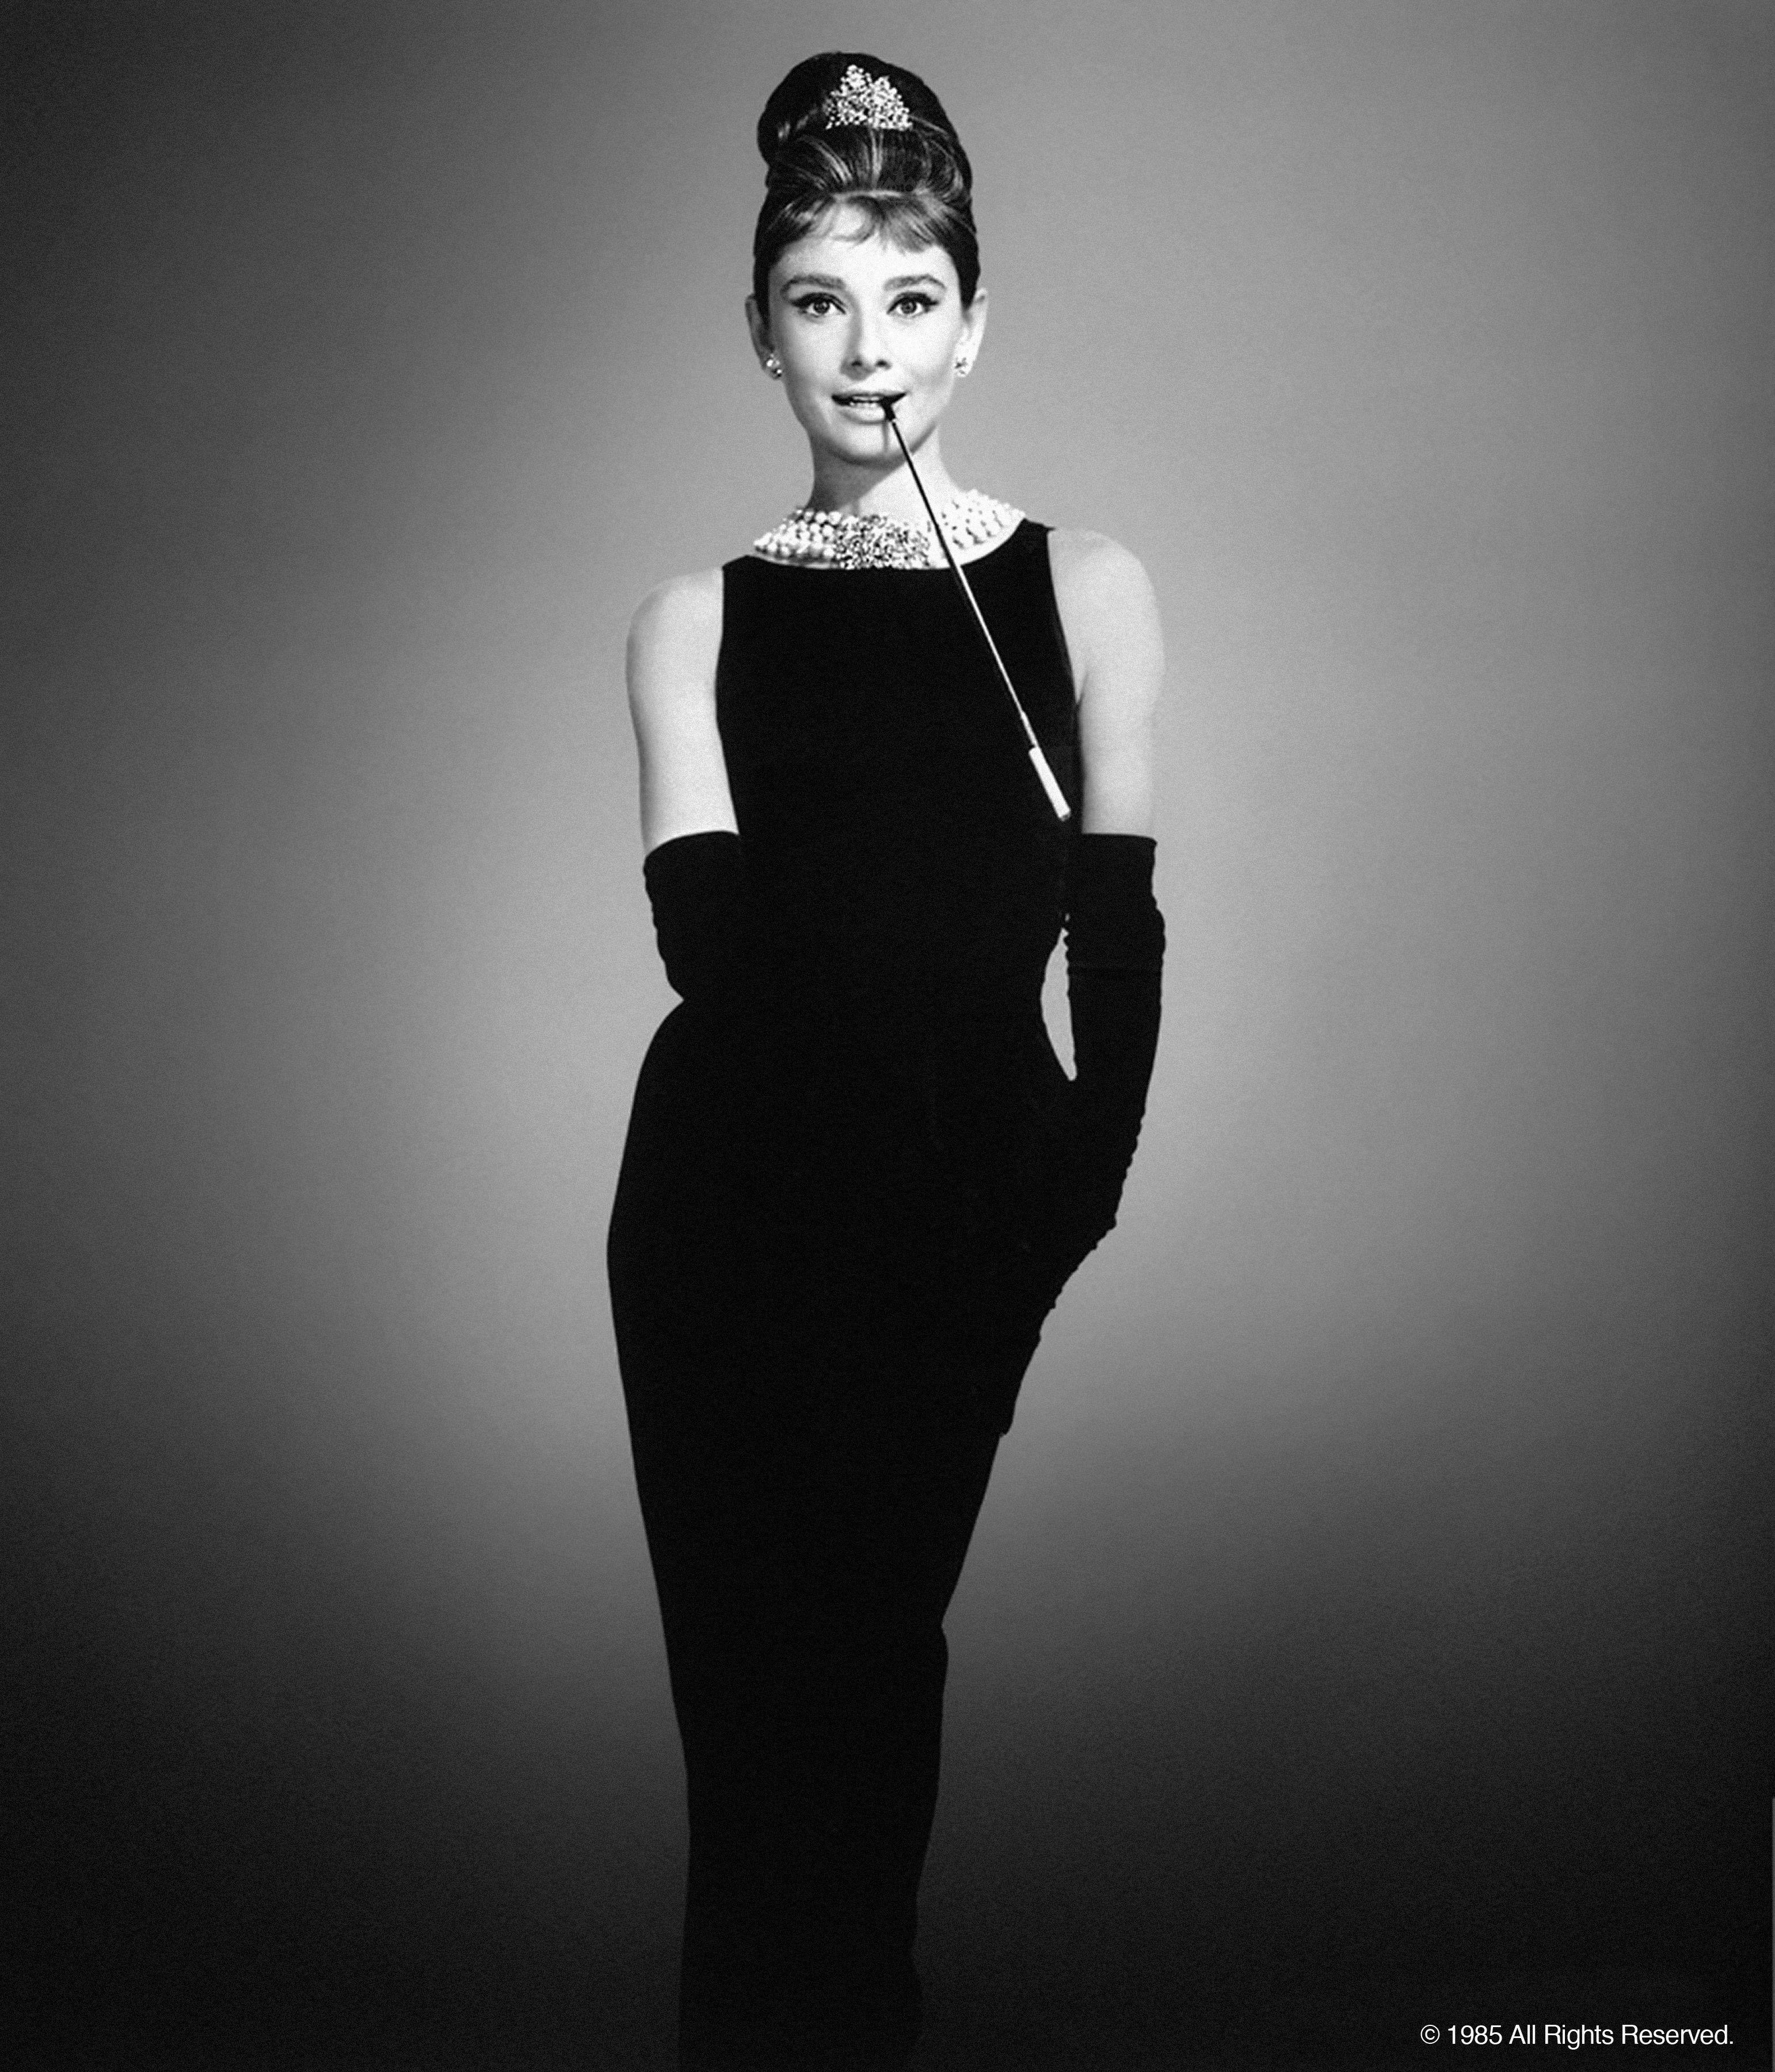 audrey hepburn black dress 24 x 48 x 1 8 glass panel. Black Bedroom Furniture Sets. Home Design Ideas